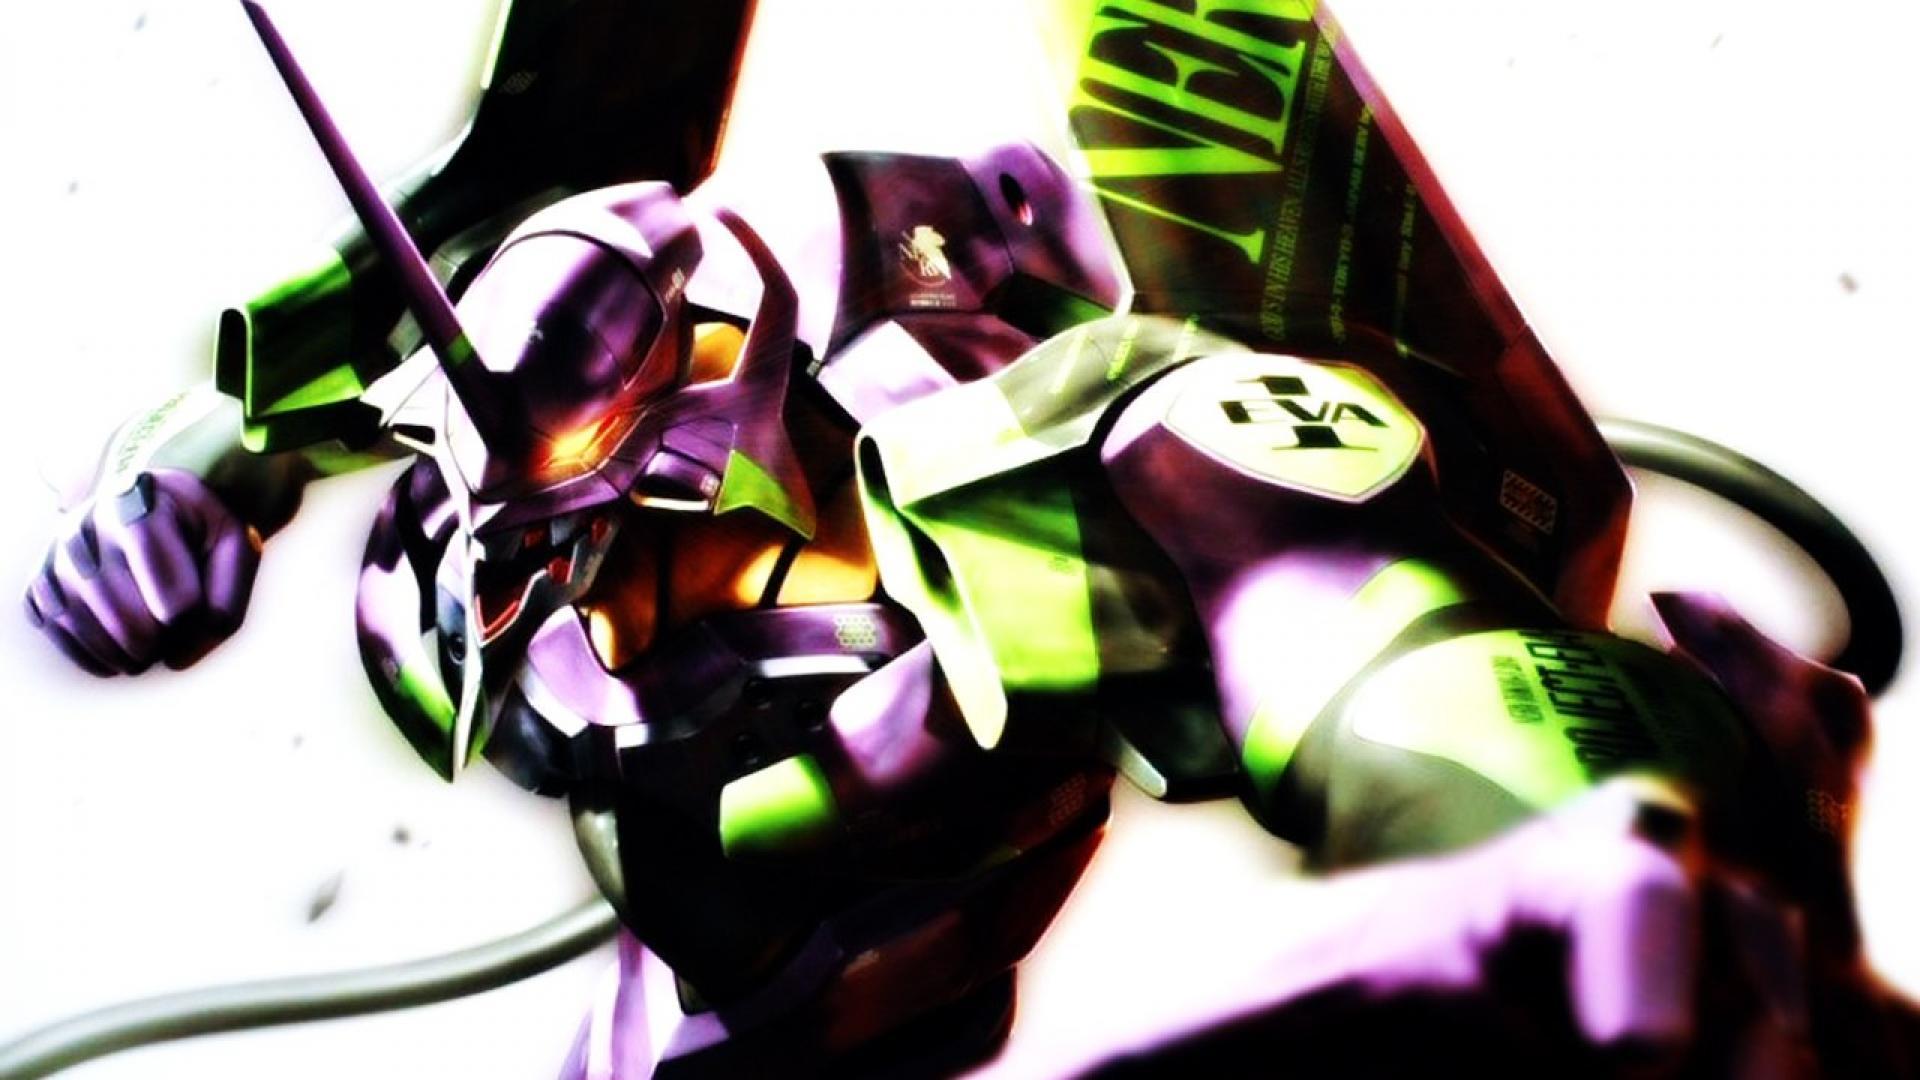 Neon genesis evangelion wallpaper 1280x800 HQ WALLPAPER   33244 1920x1080